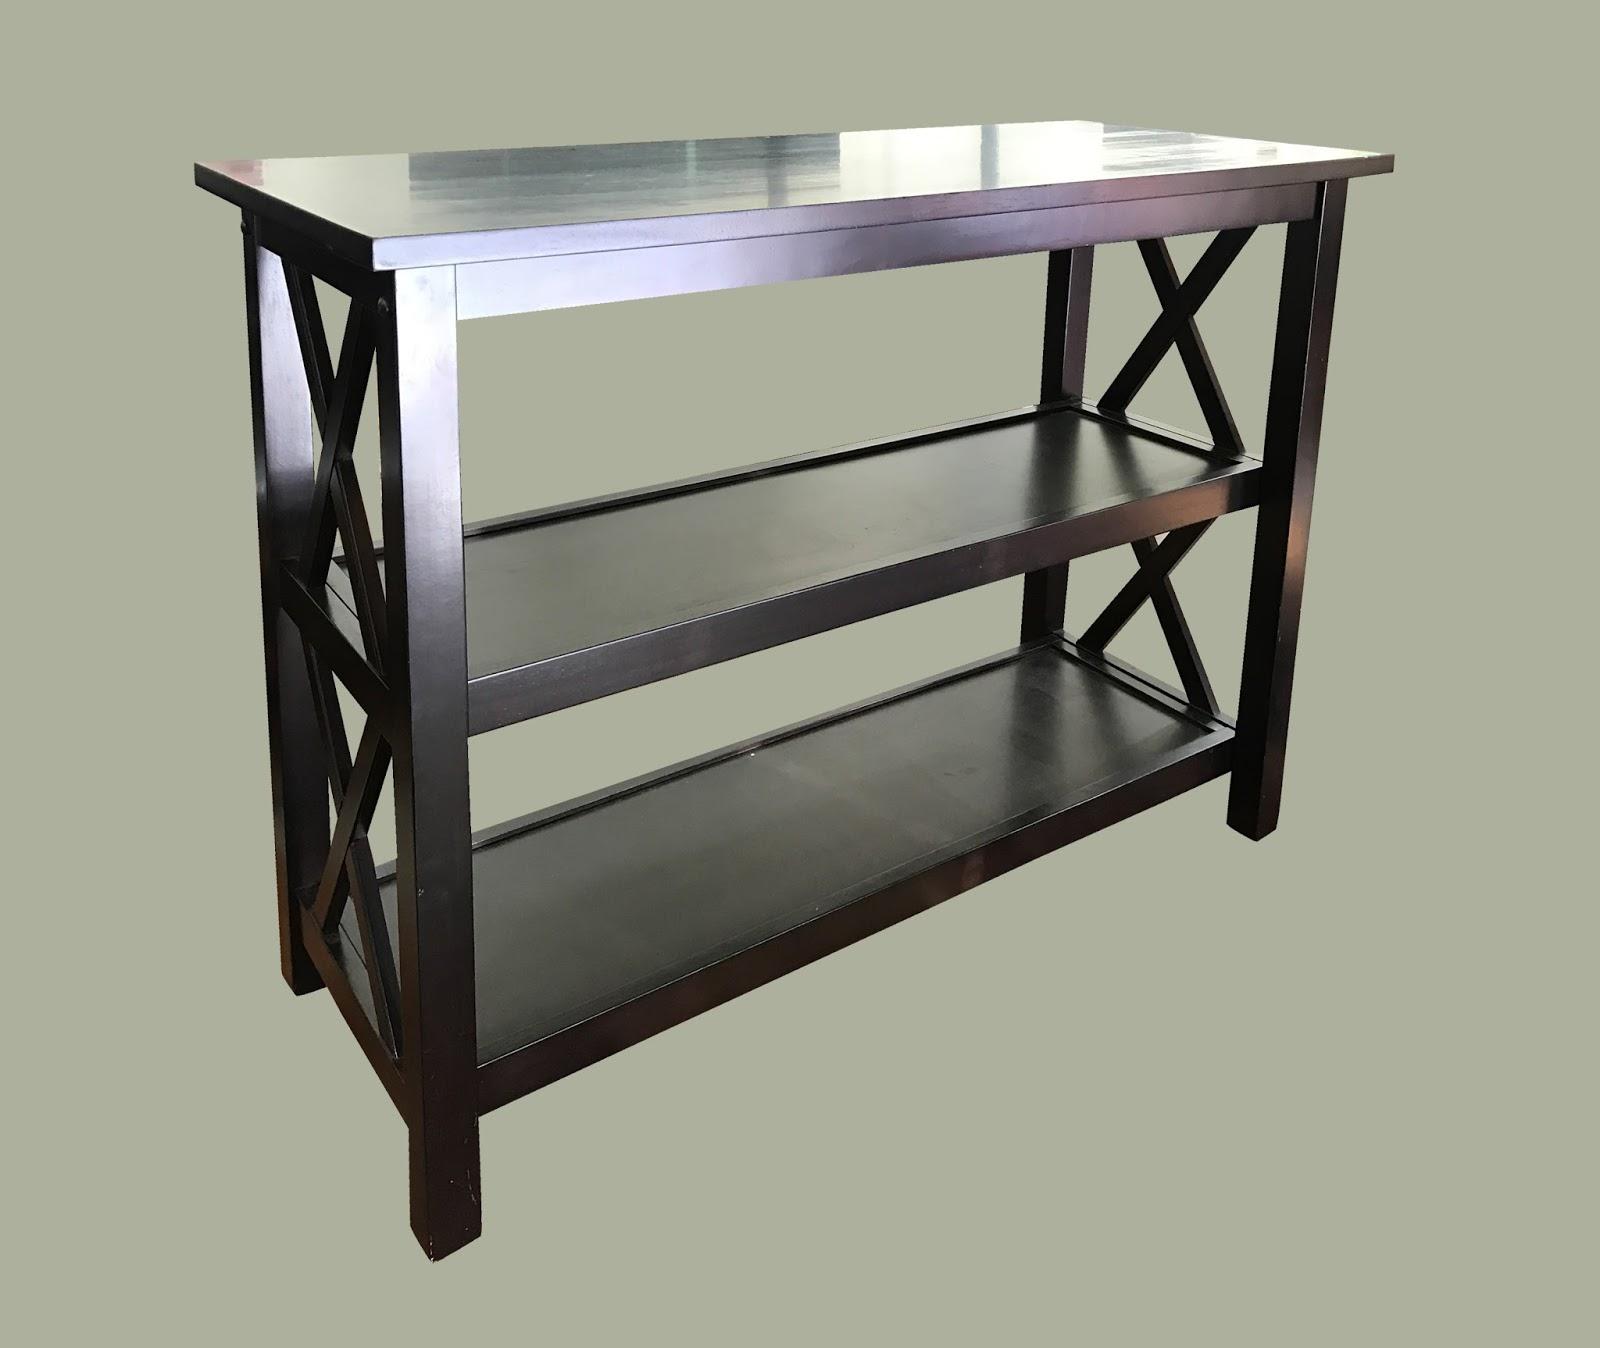 Uhuru Furniture Collectibles Backless Shelf 65 Sold